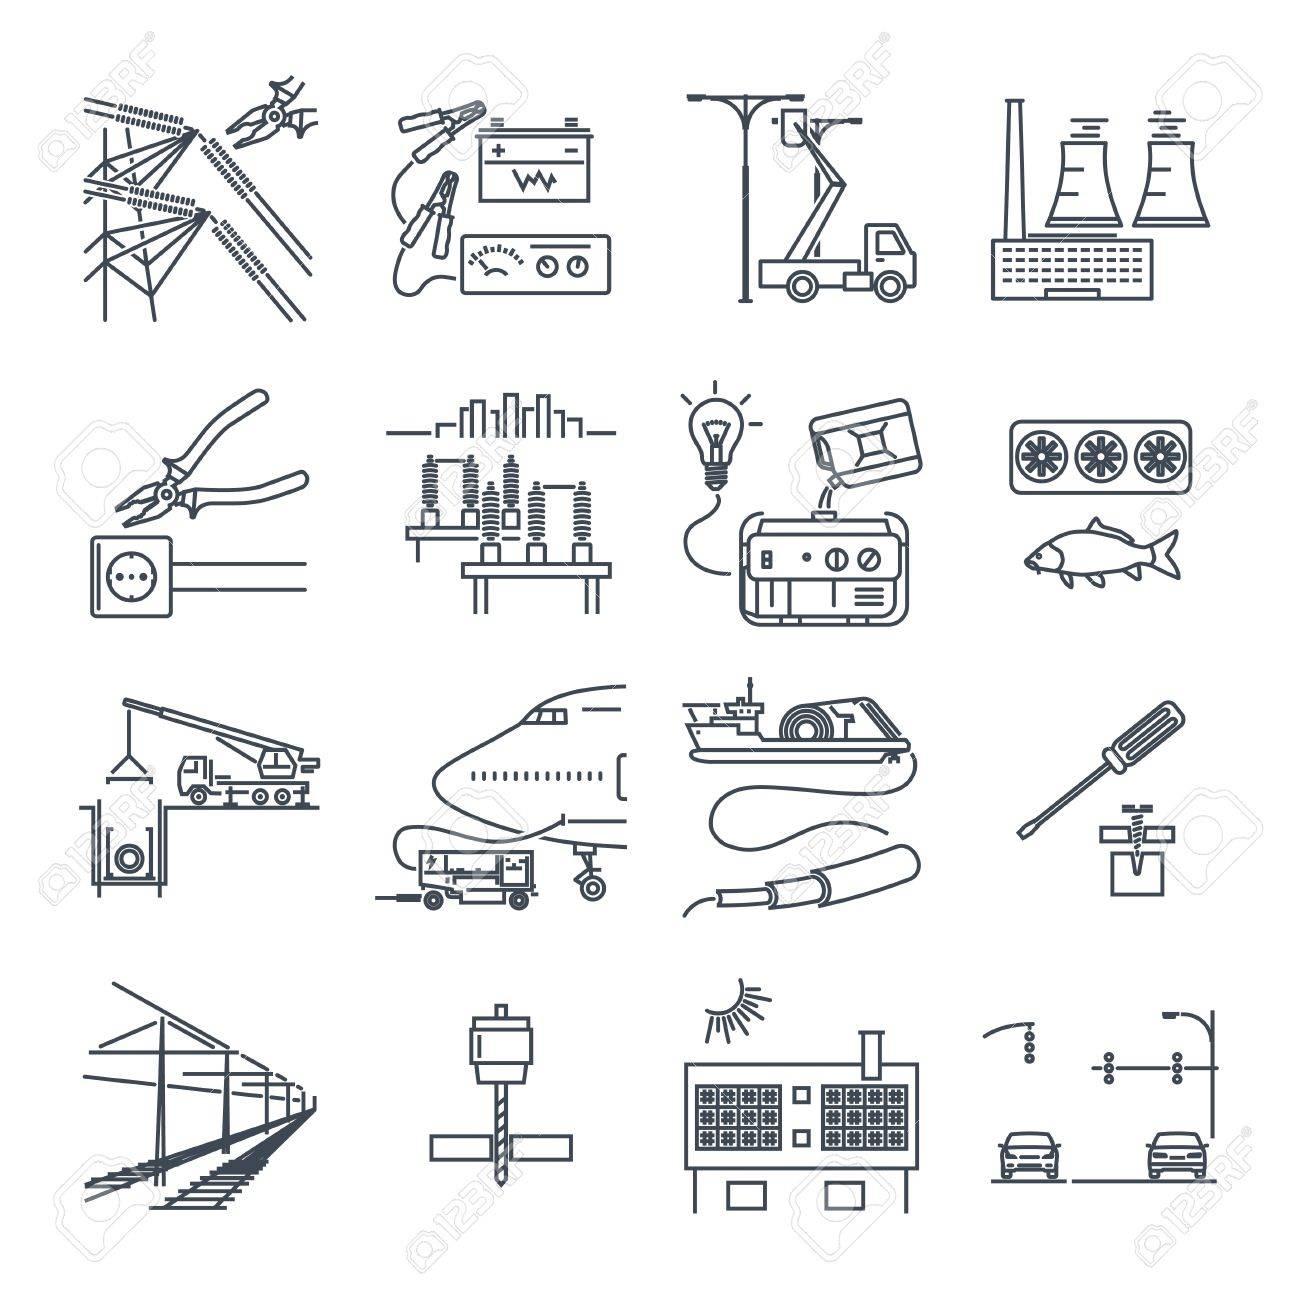 Groß Elektrische Simbolen Bilder - Schaltplan Serie Circuit ...